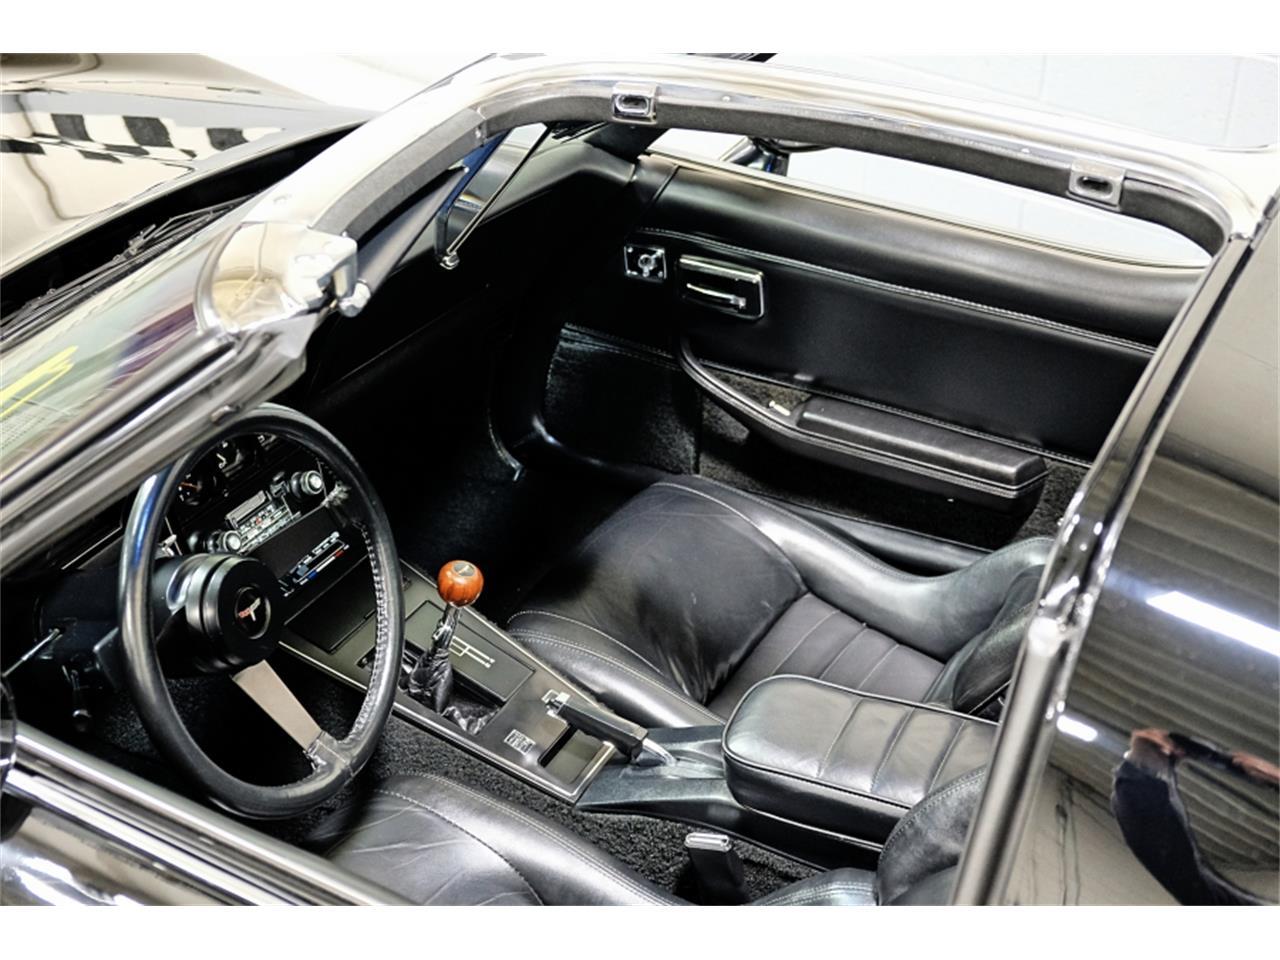 1980 Chevrolet Corvette (CC-1343657) for sale in Old Forge, Pennsylvania